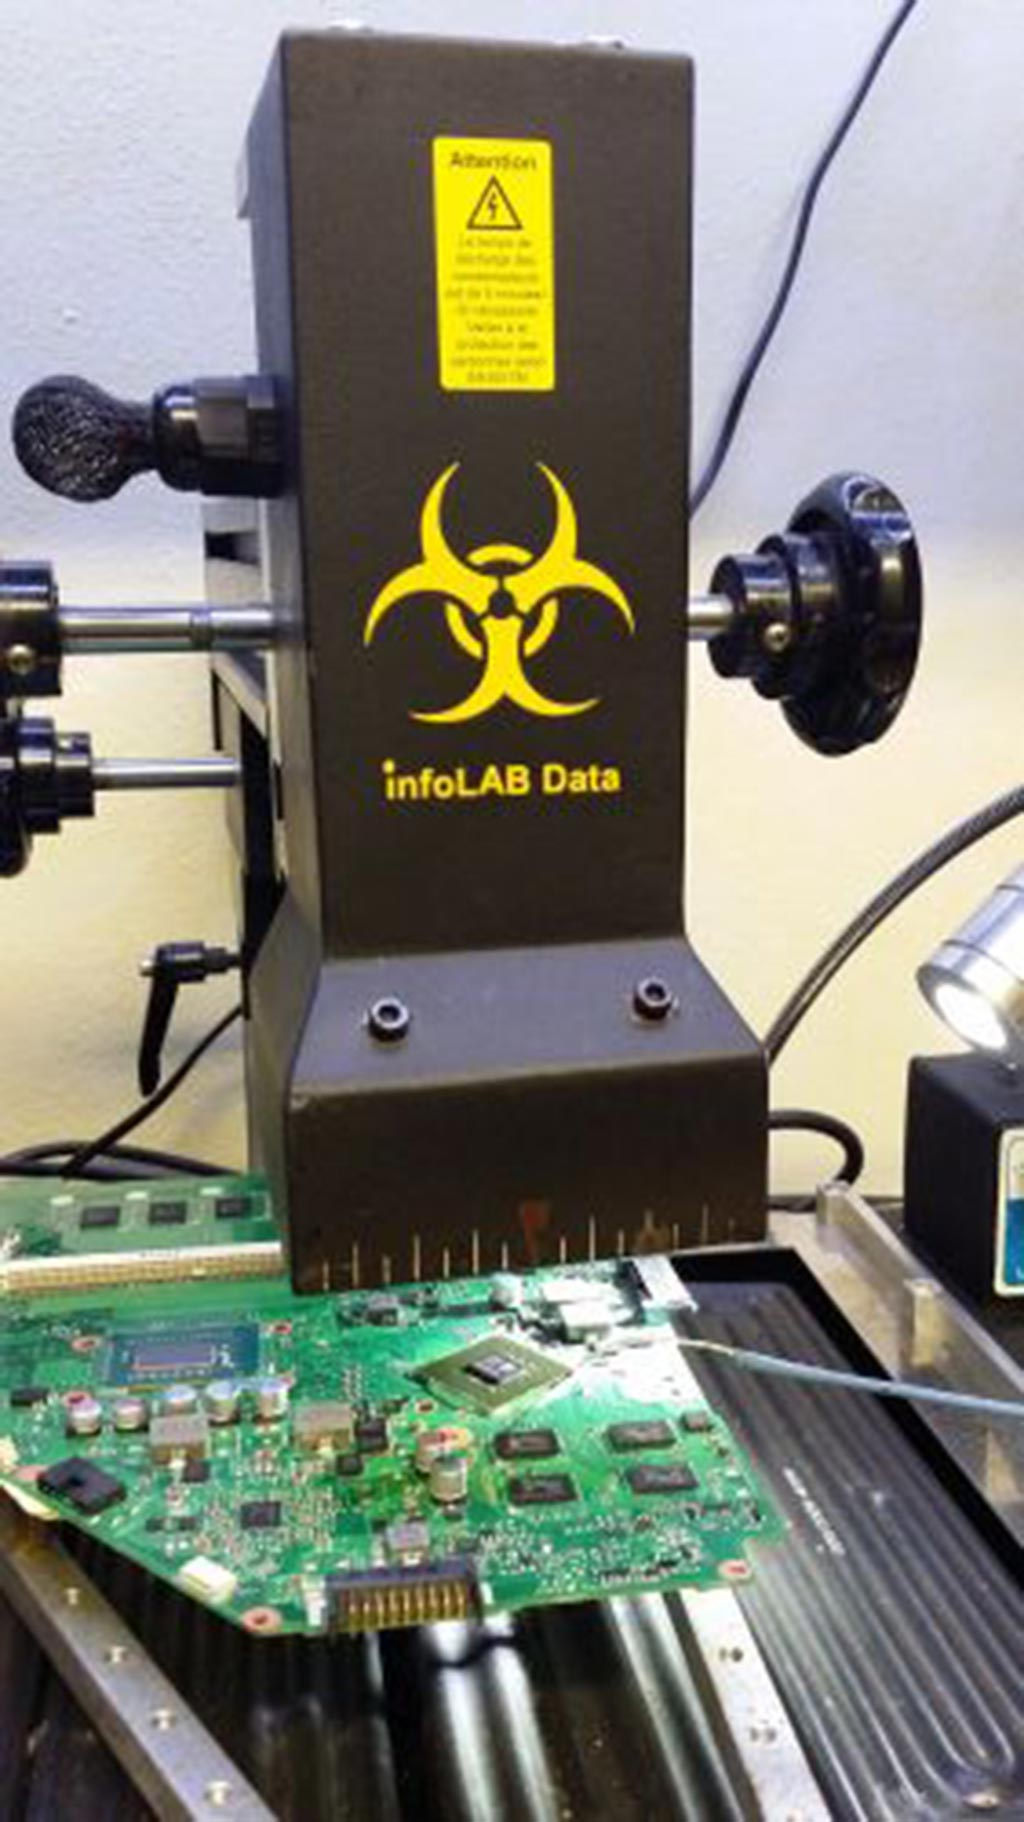 soldering-station-infolabdata